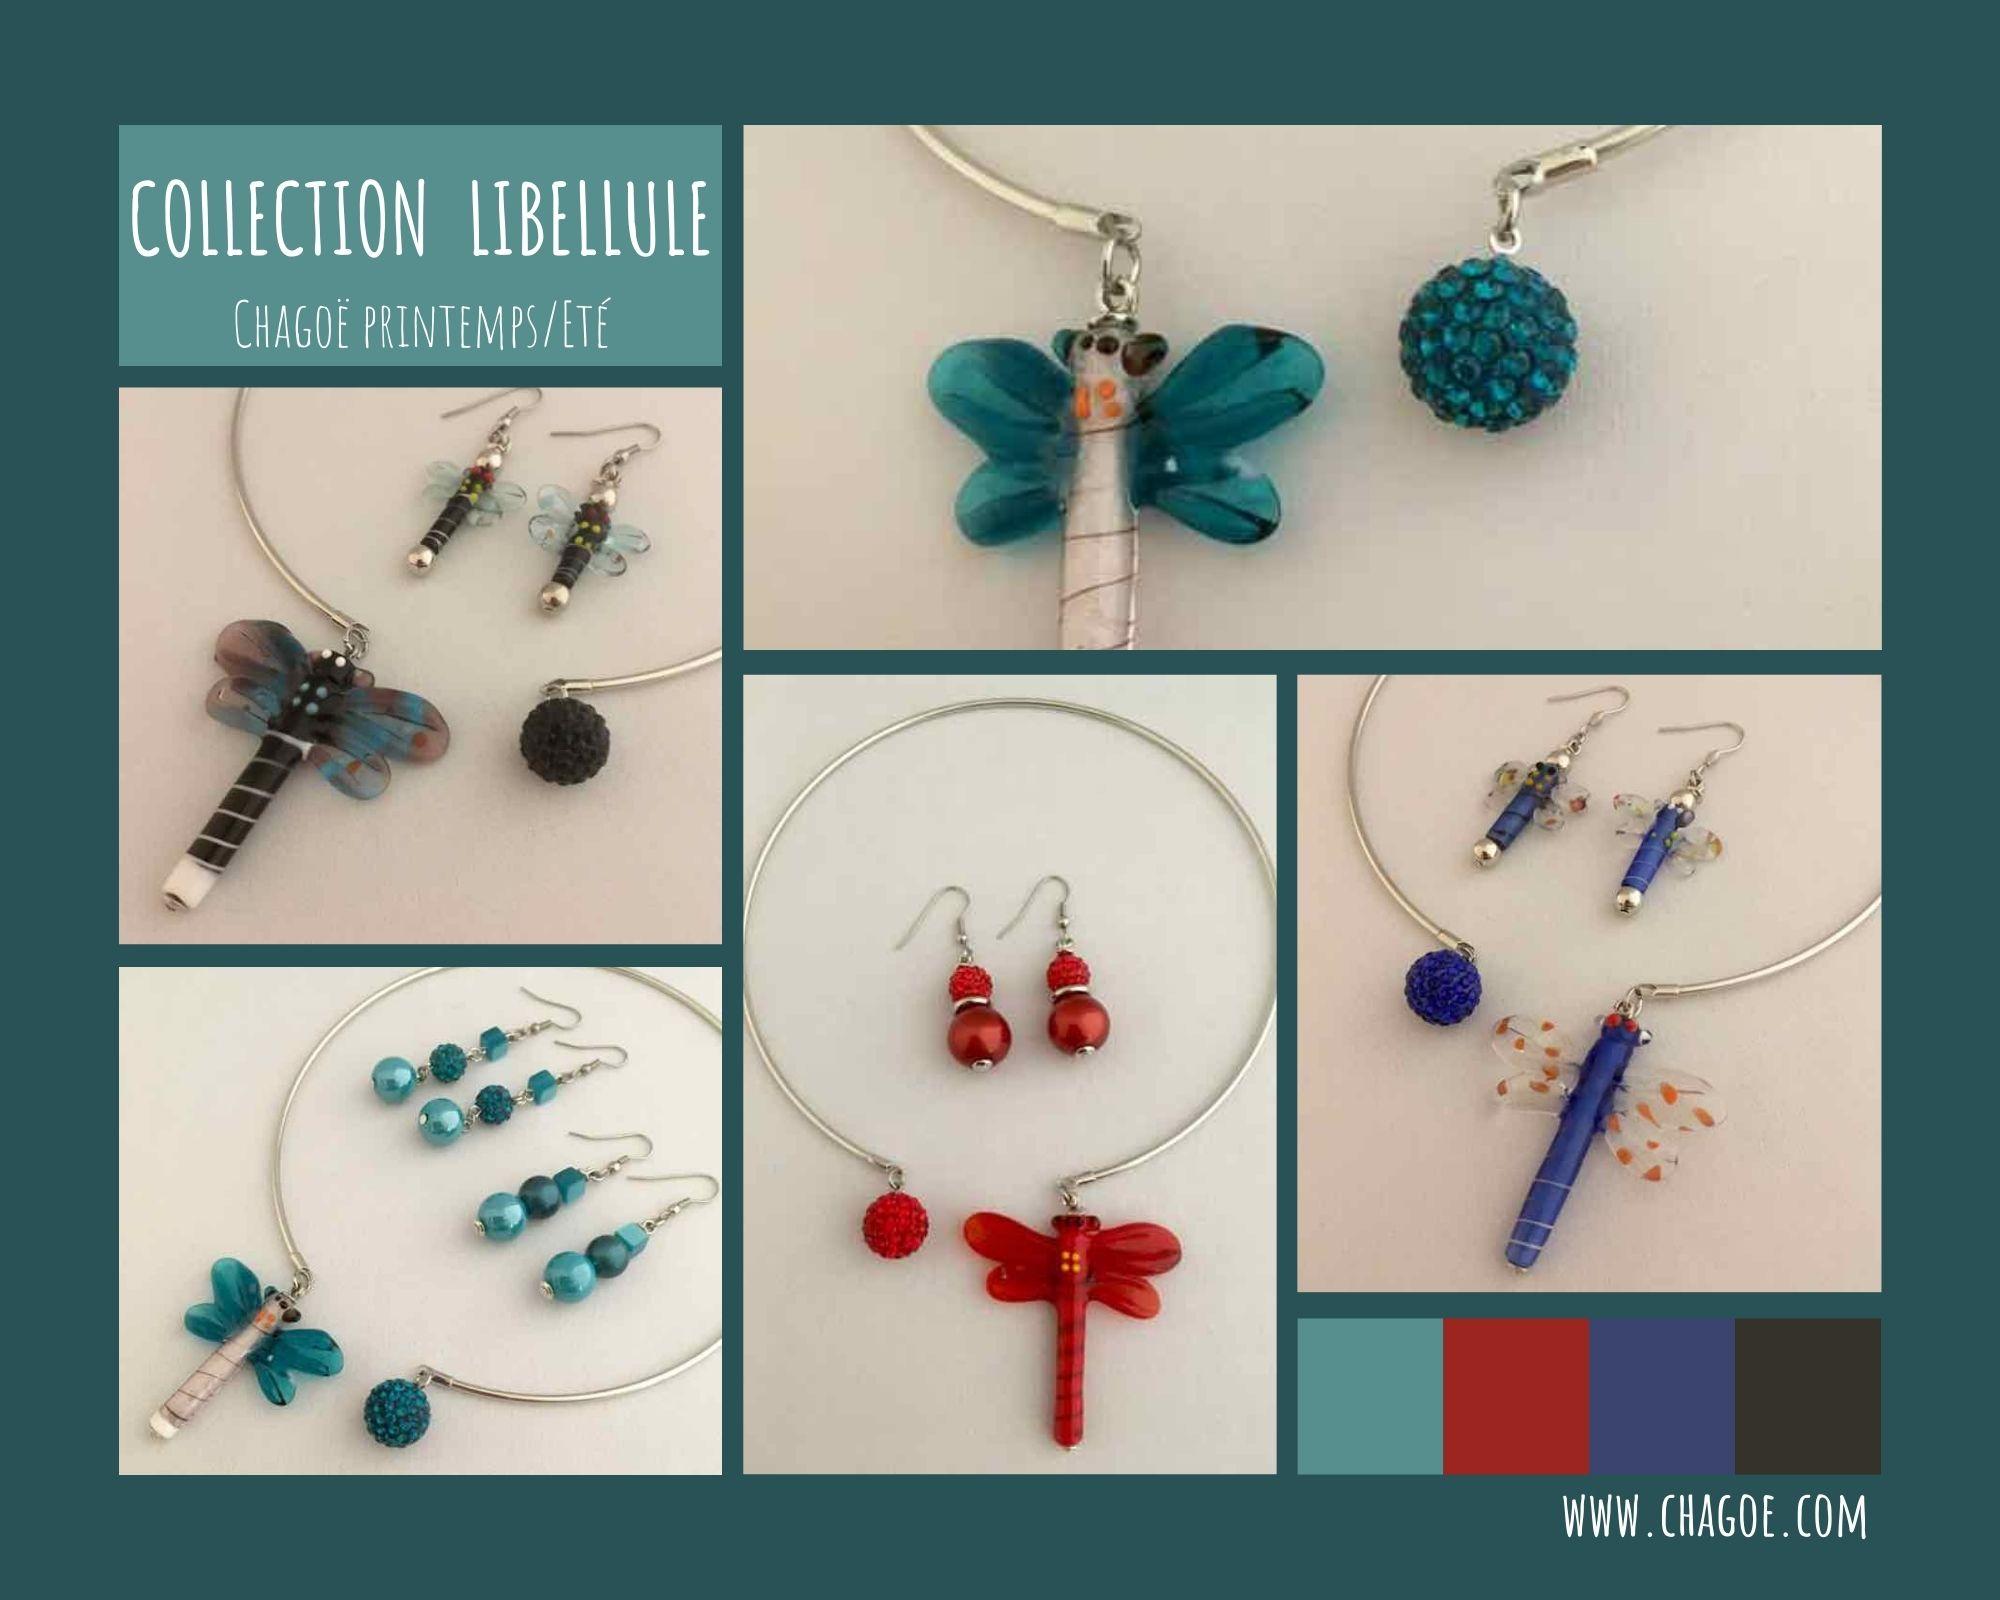 Collection LIBELLULE Chagoë 2021